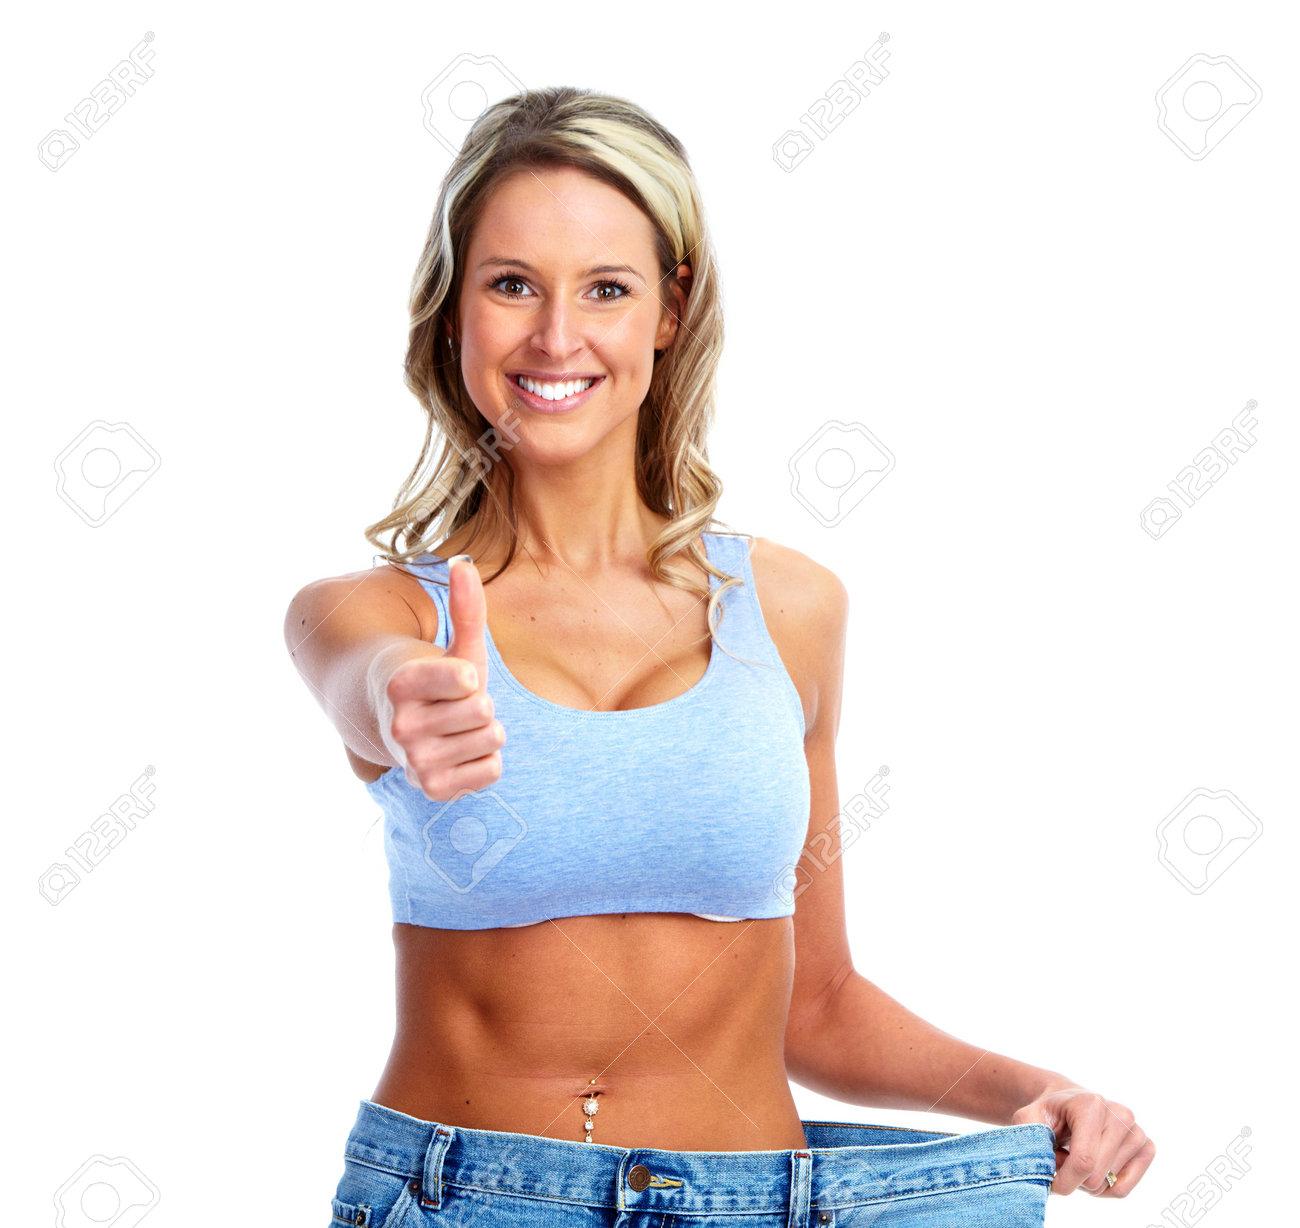 Weight loss. Stock Photo - 12379144